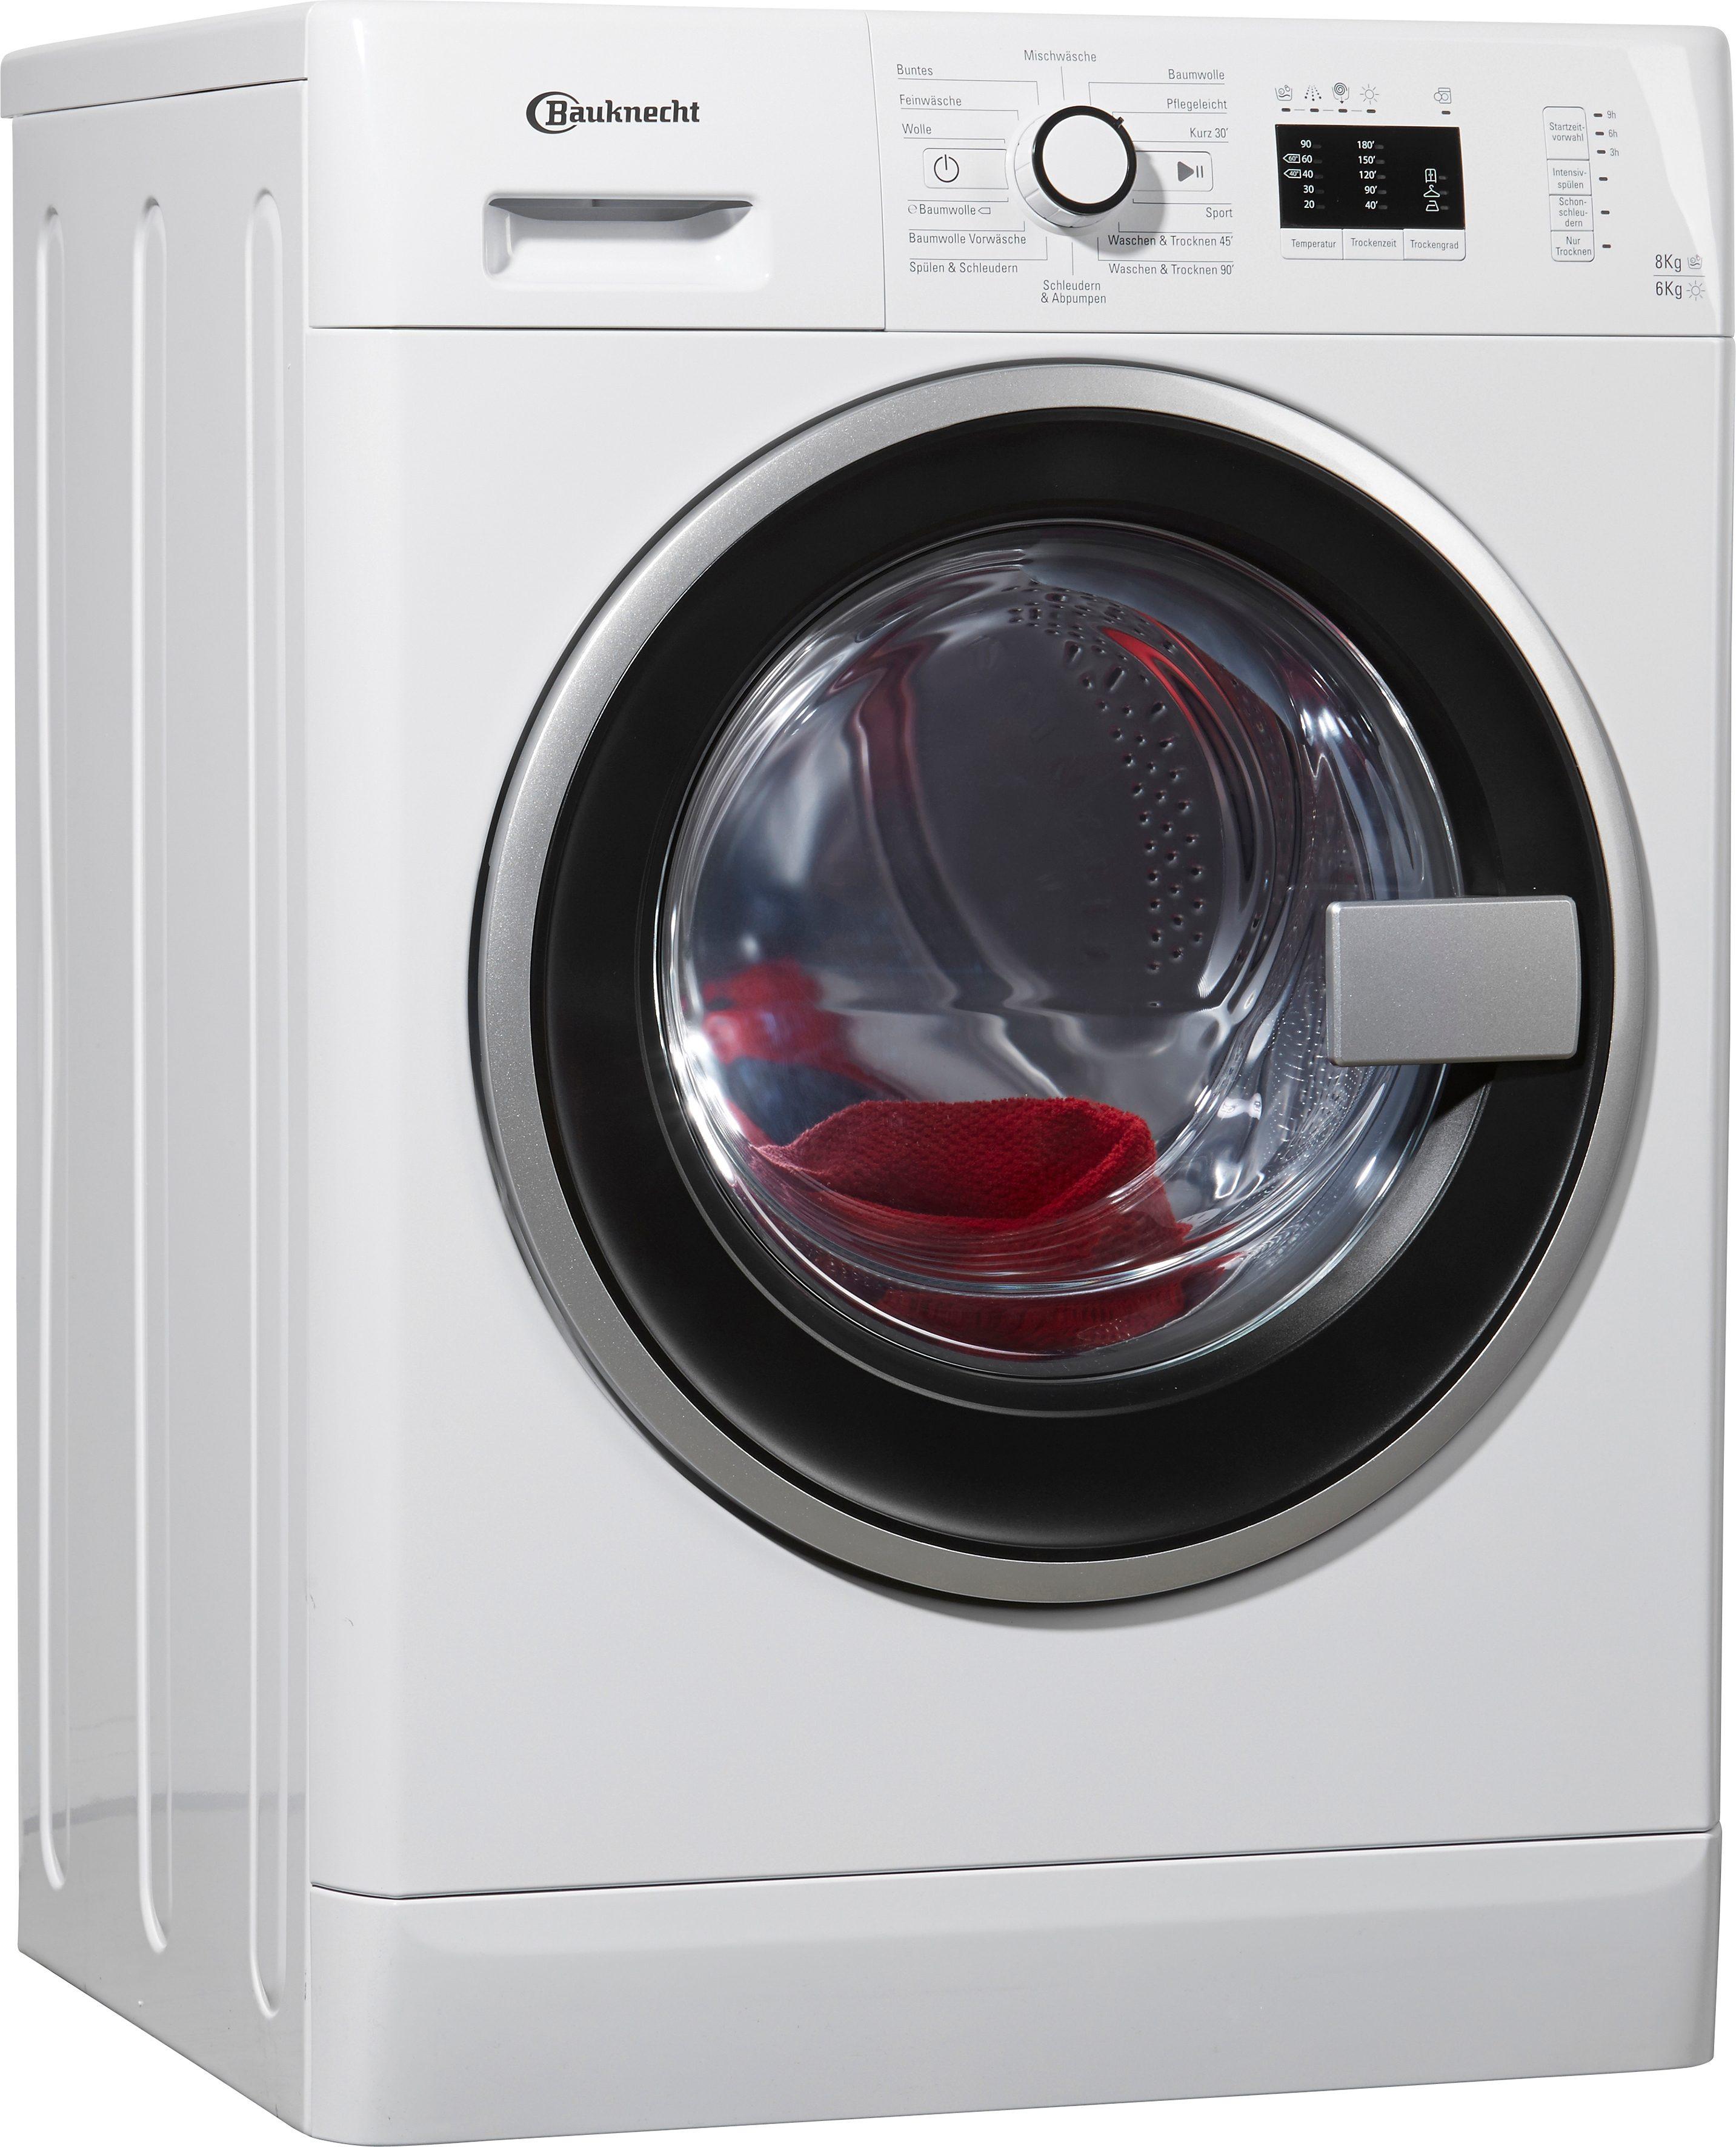 BAUKNECHT Waschtrockner WATK Prime 8614, A, 8 kg / 6 kg, 1.400 U/Min